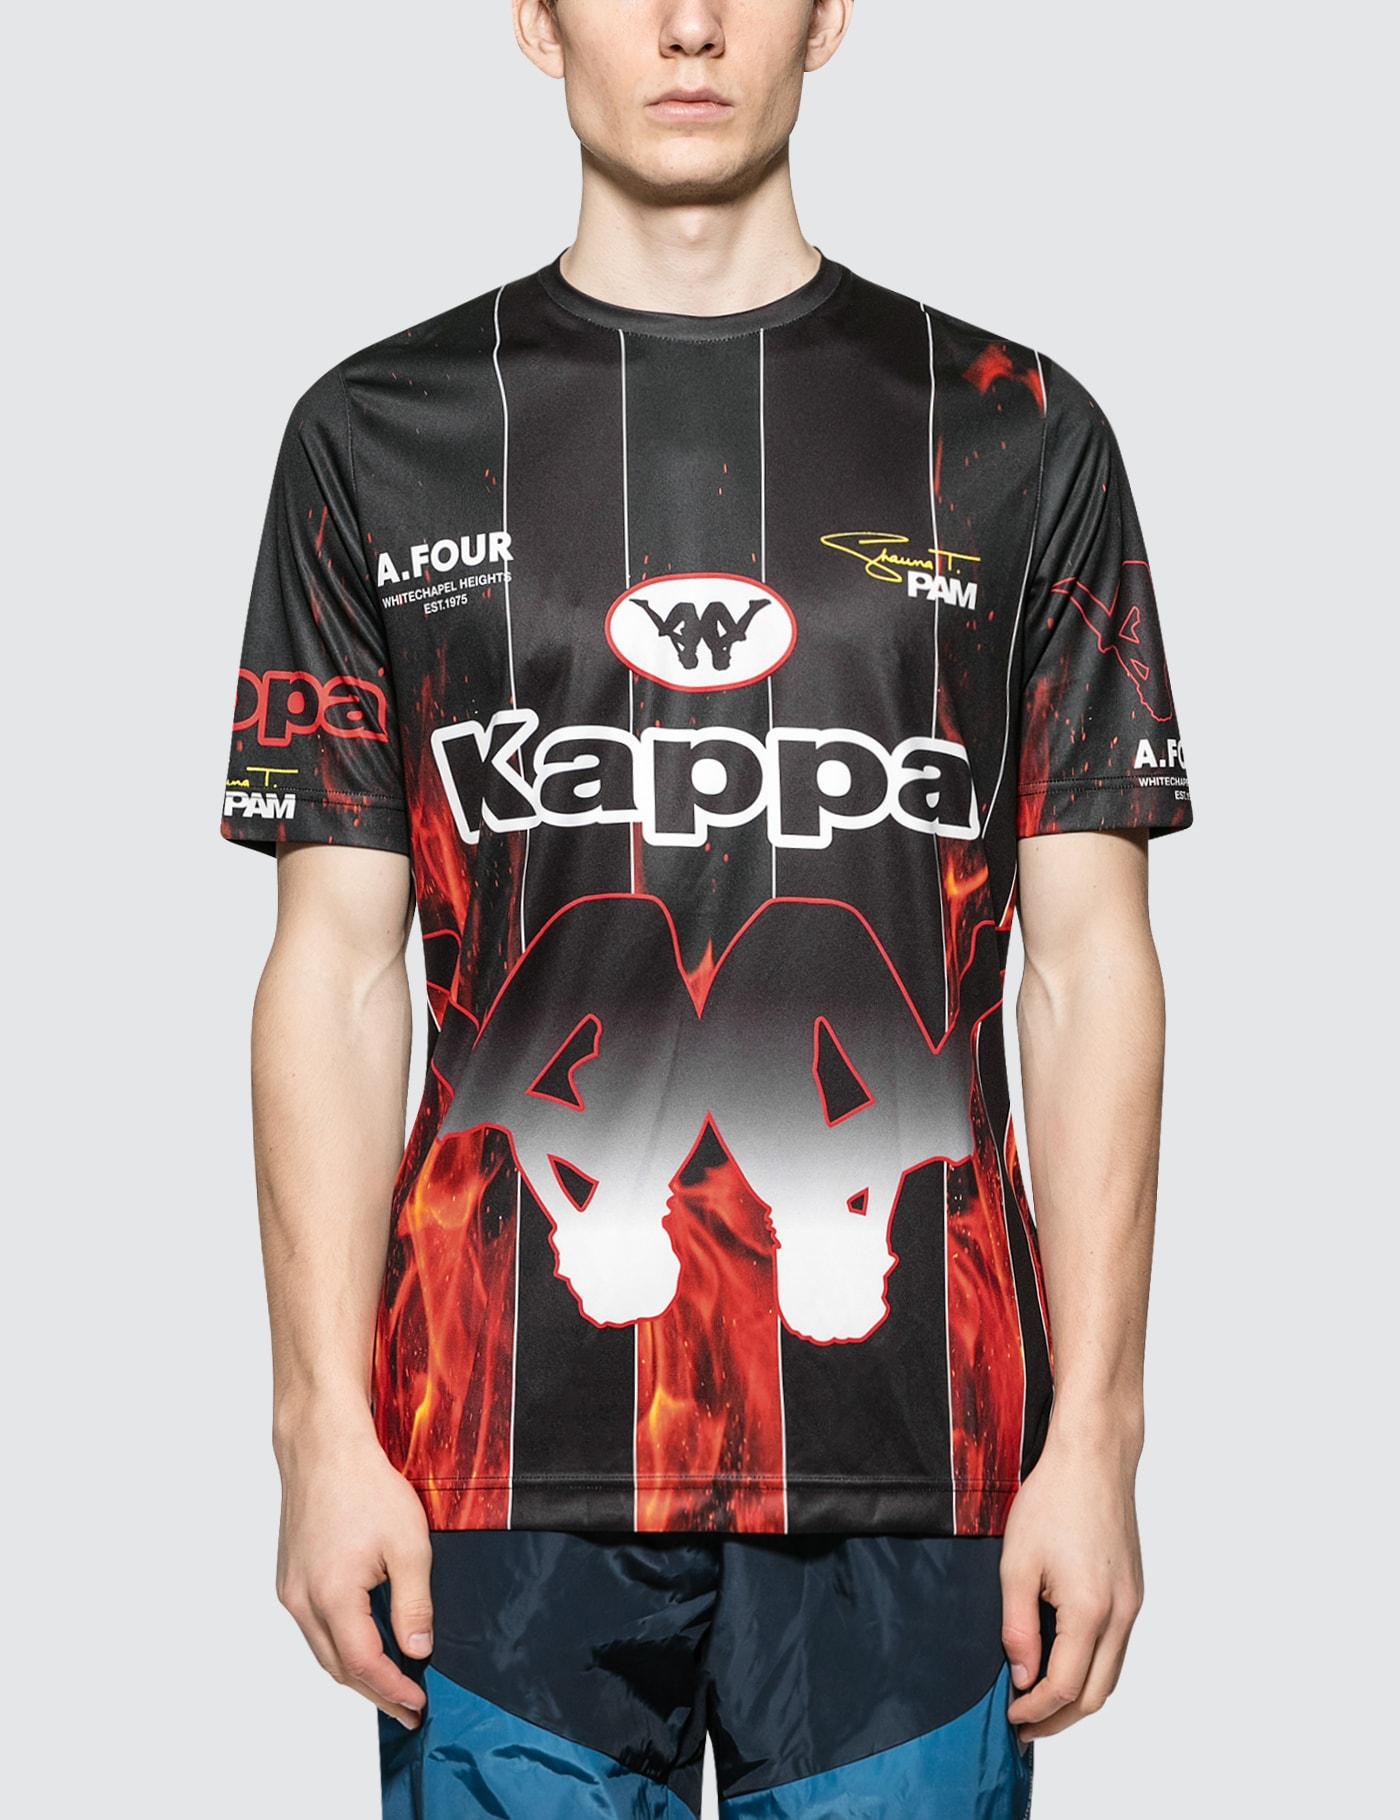 Perks and Mini P.A.M. x A.Four Labs x Kappa Sublimation Football Shirt